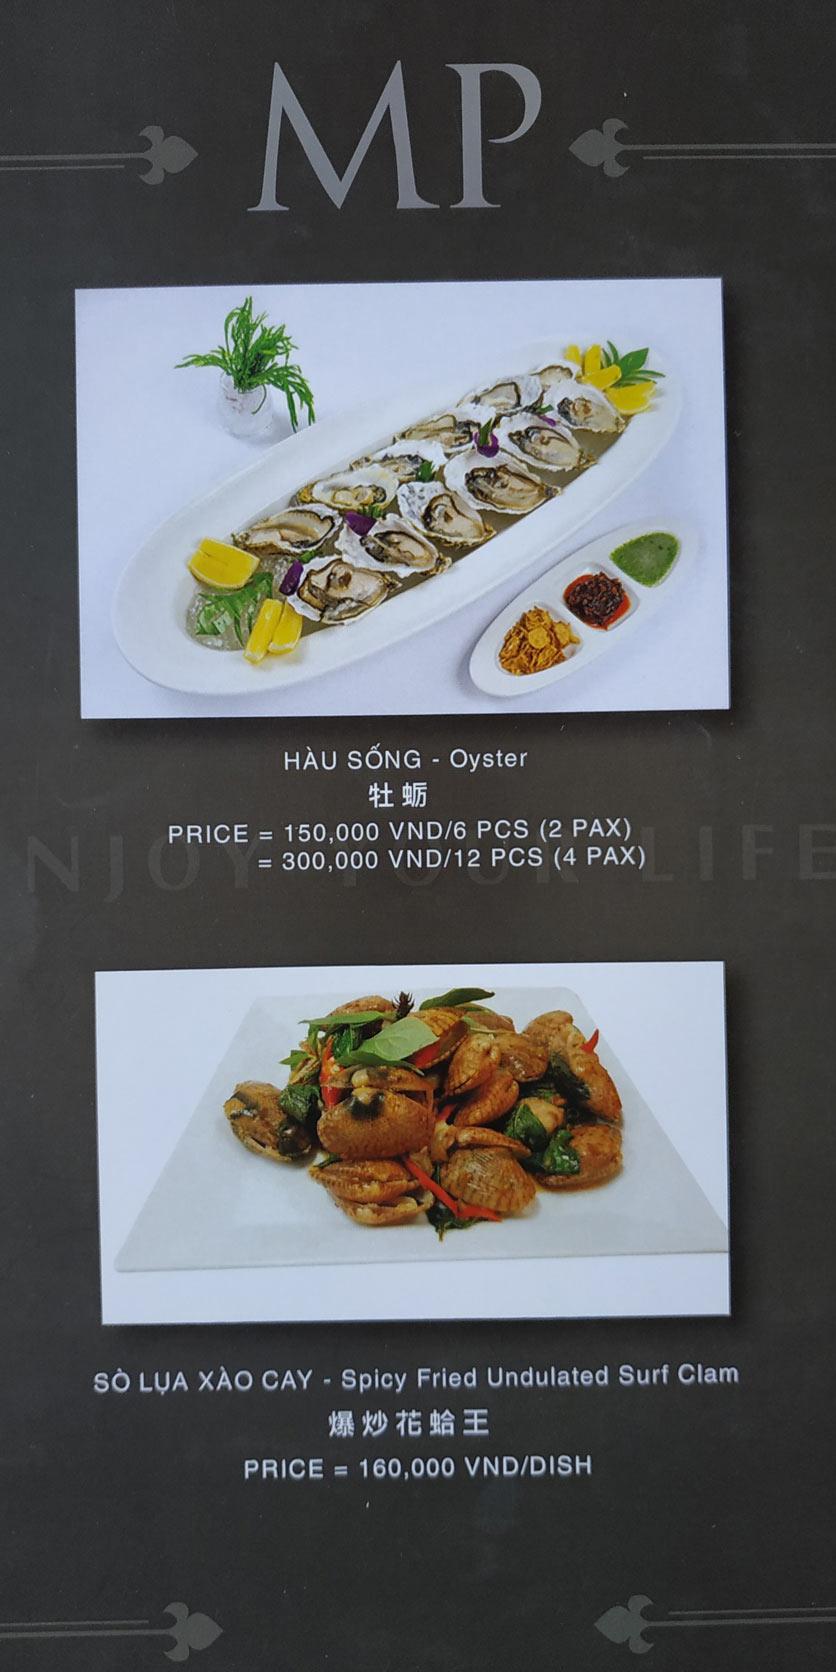 Menu MP Thai Seafood Restaurant - Phạm Văn Đồng 16